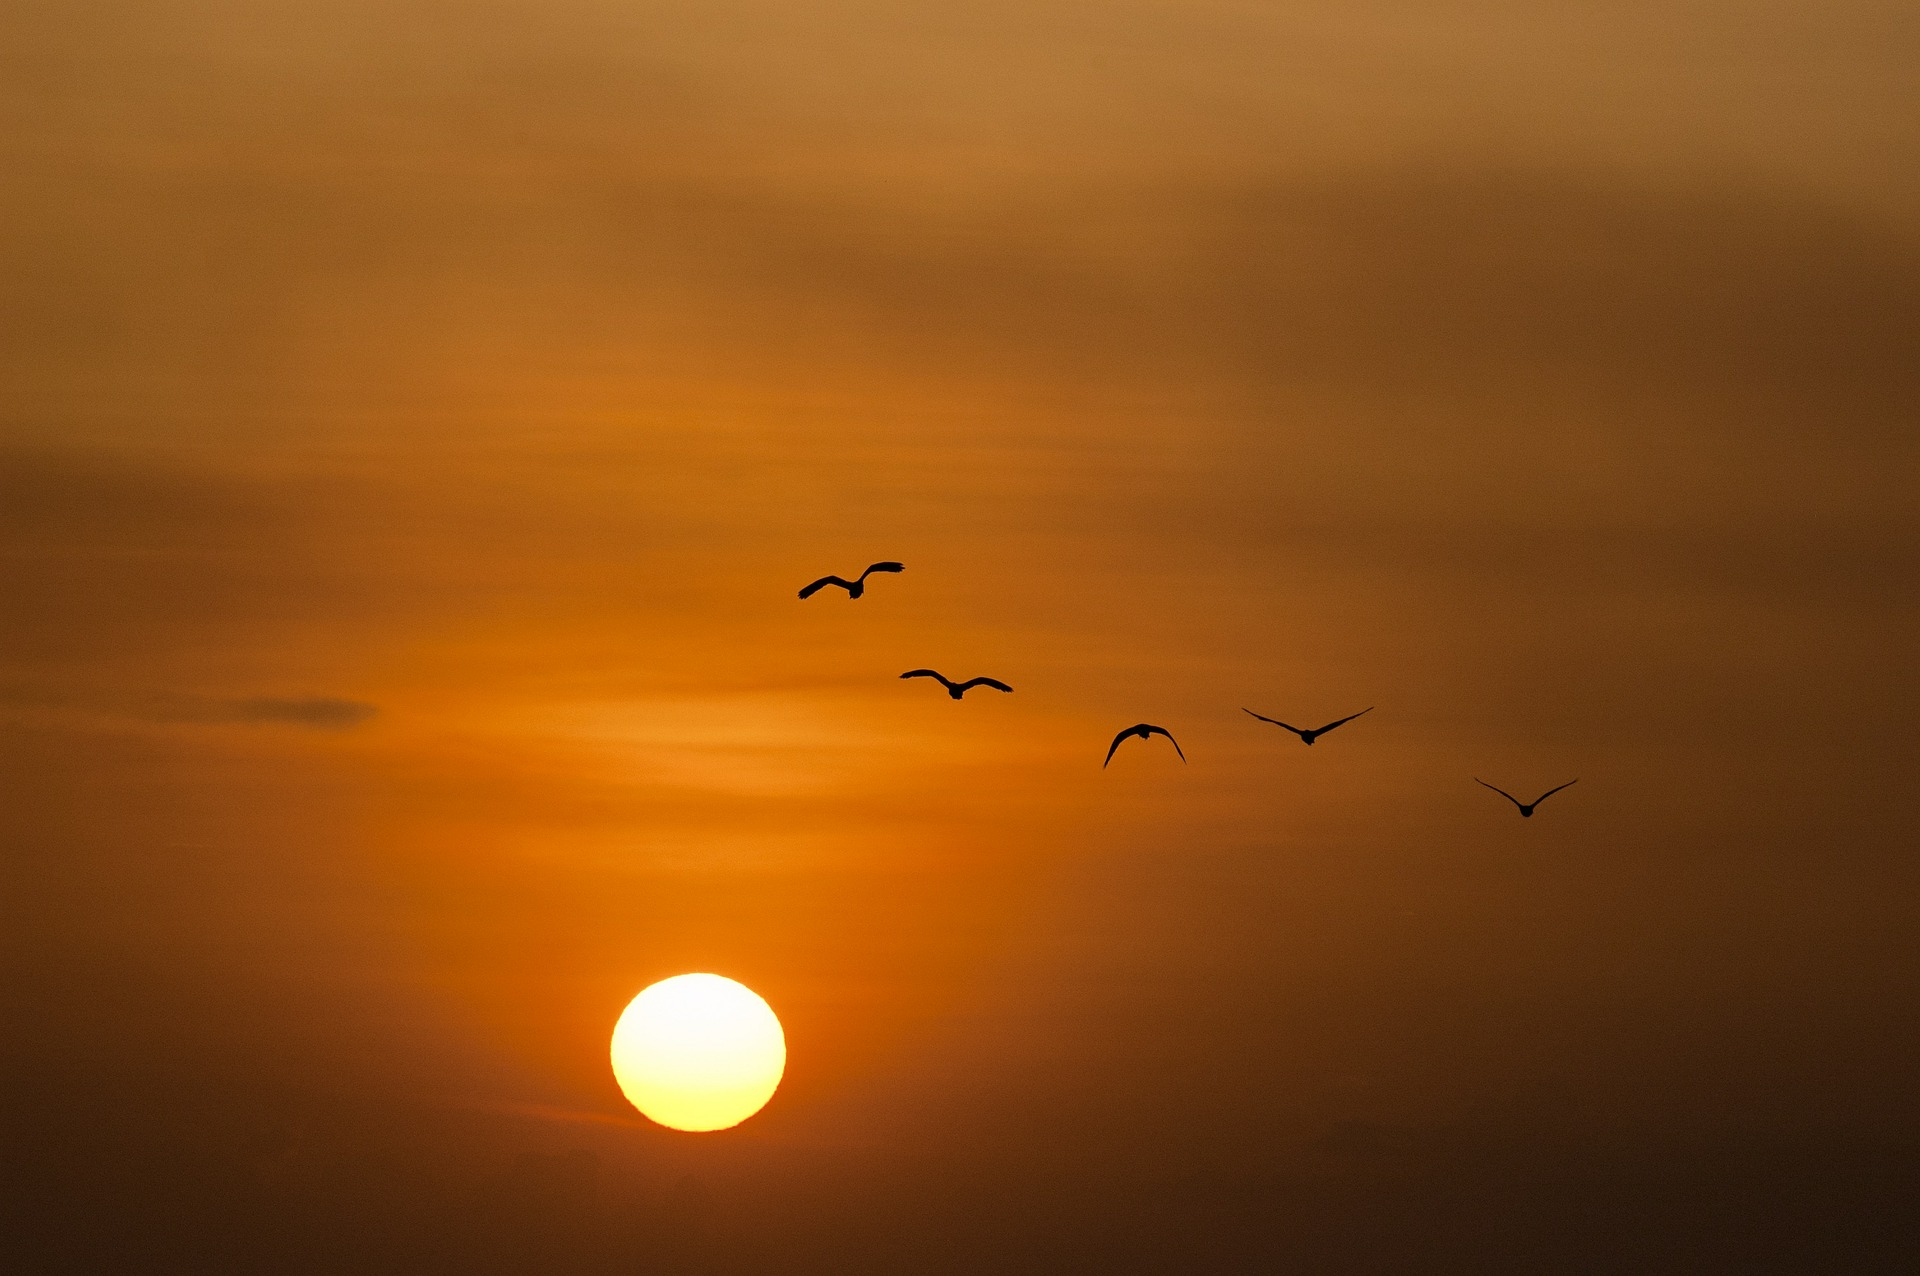 sunset-600095_1920_1559497052810.jpg